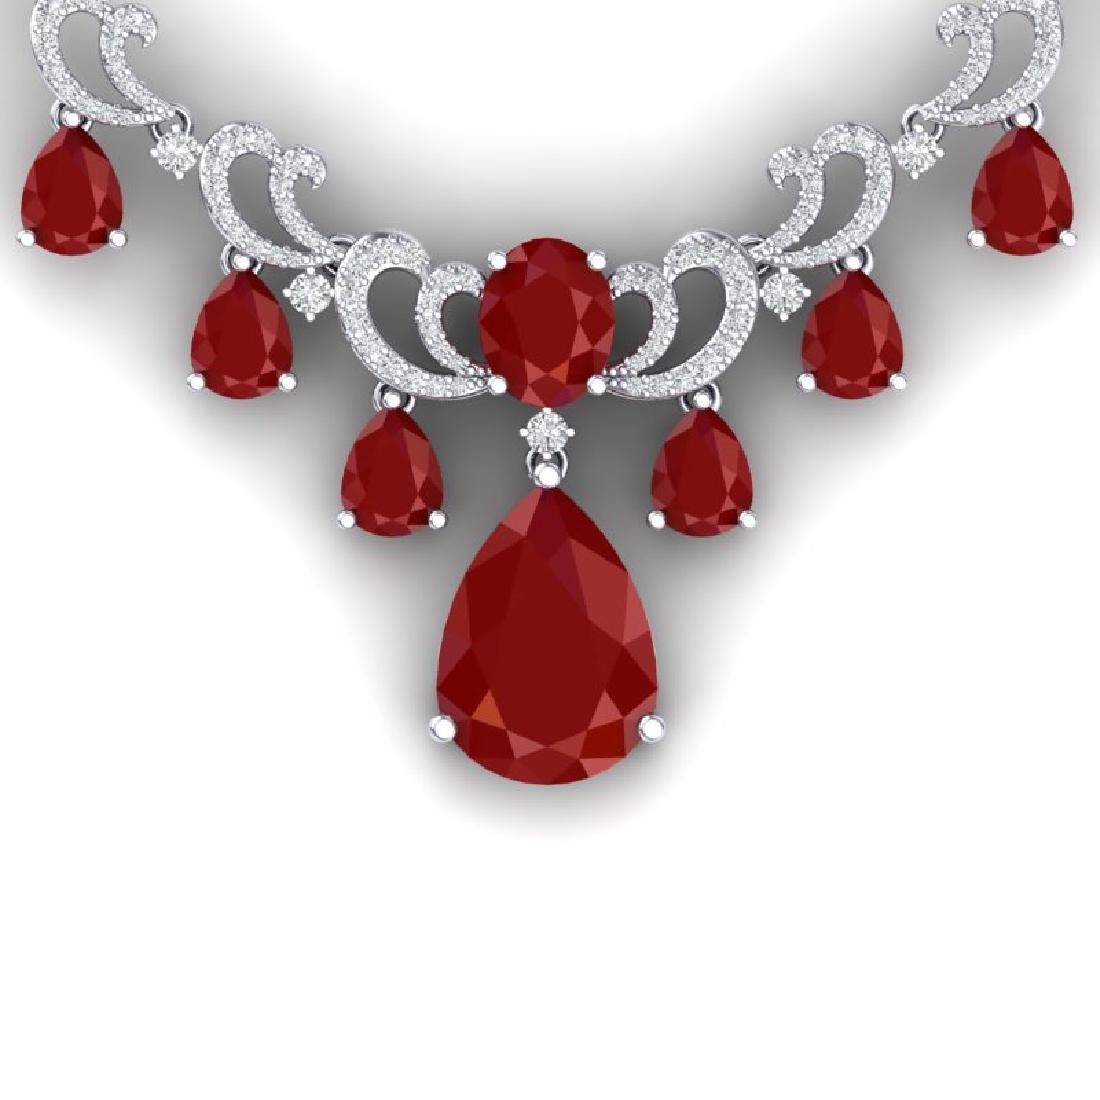 36.85 CTW Royalty Ruby & VS Diamond Necklace 18K White